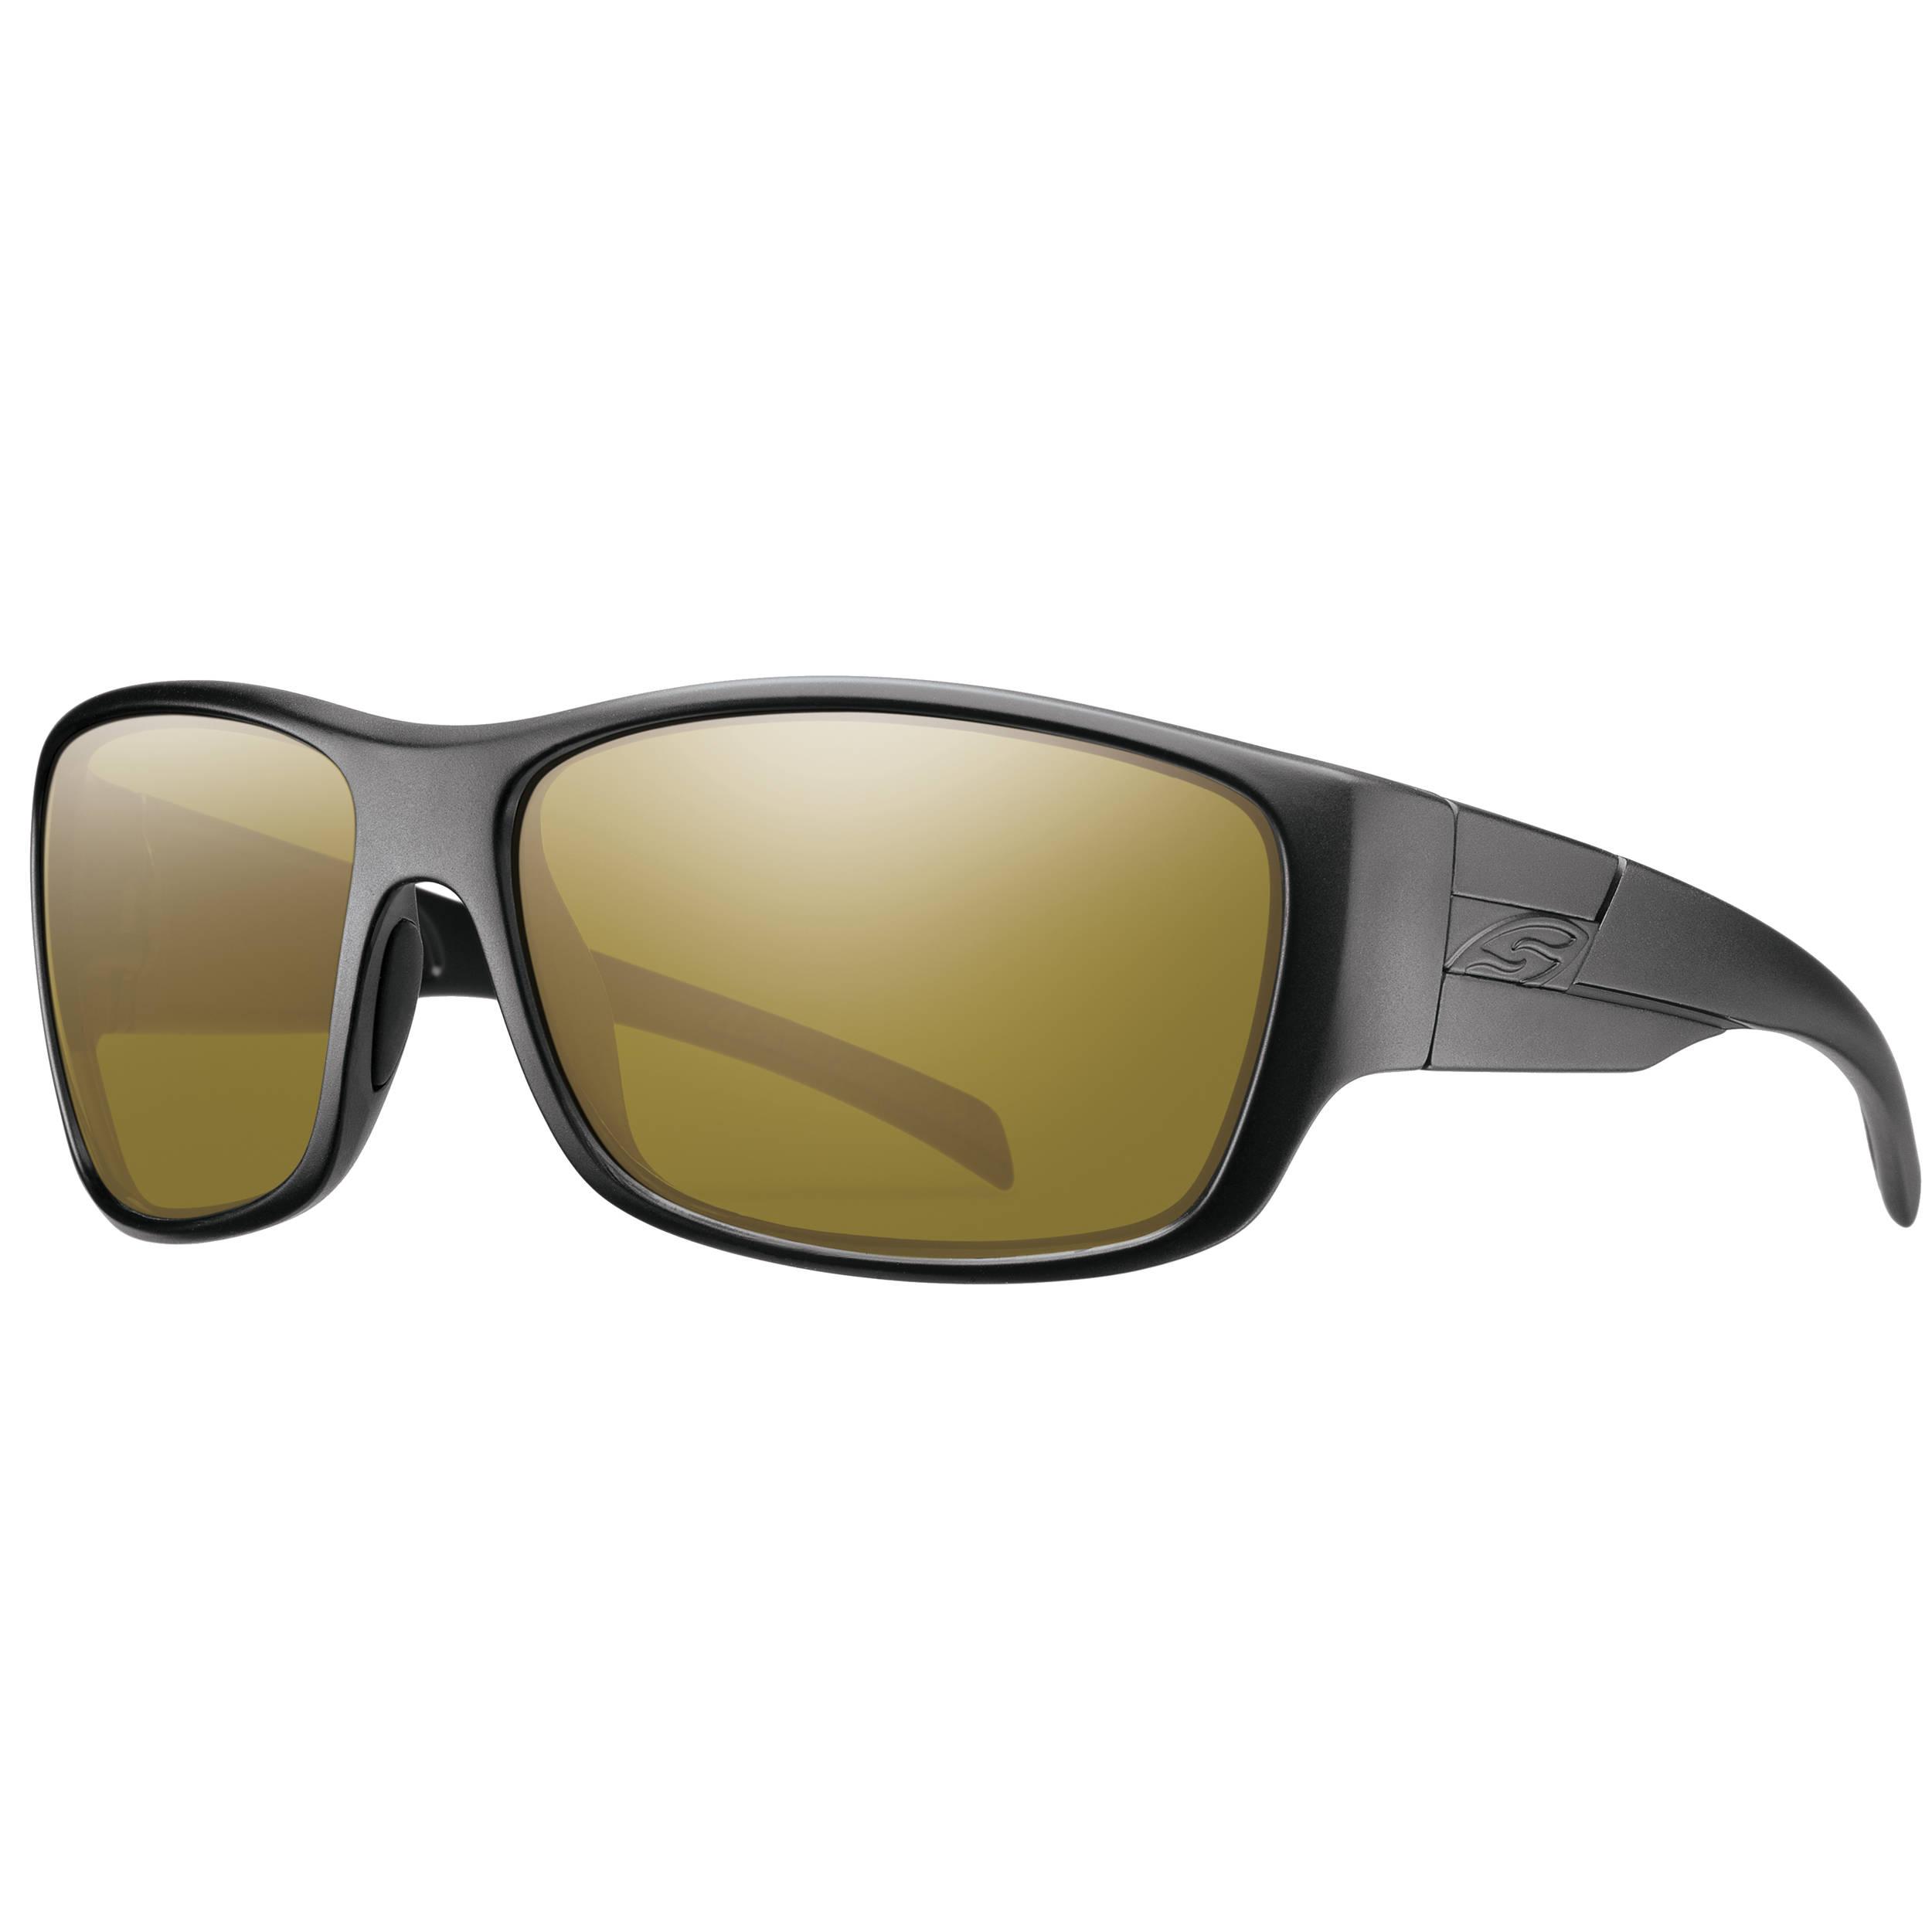 Smith Optics Sunglasses | www.tapdance.org